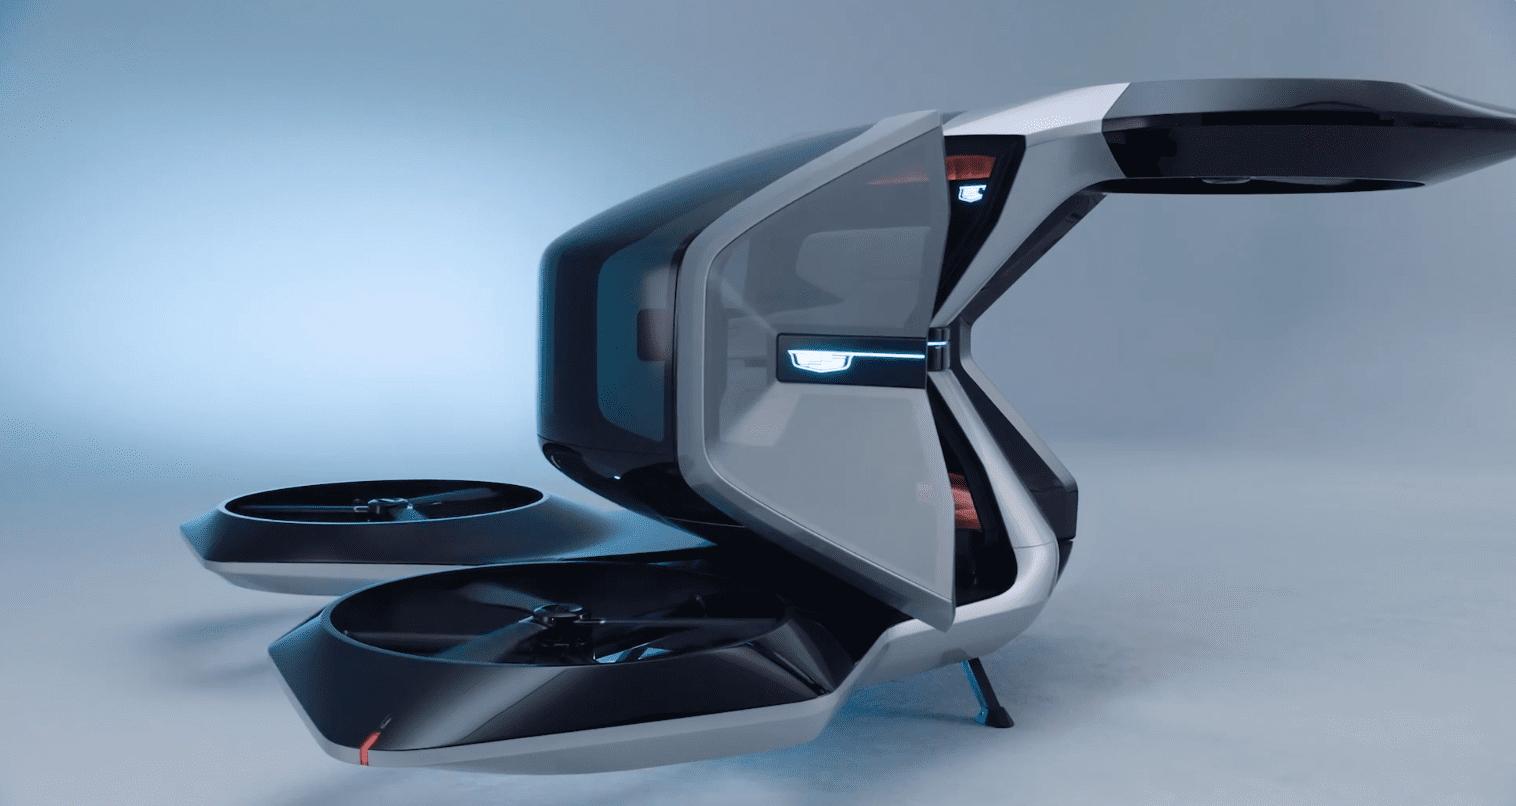 CES 2021 – Το υπέροχο Cadillac VTOL Concept